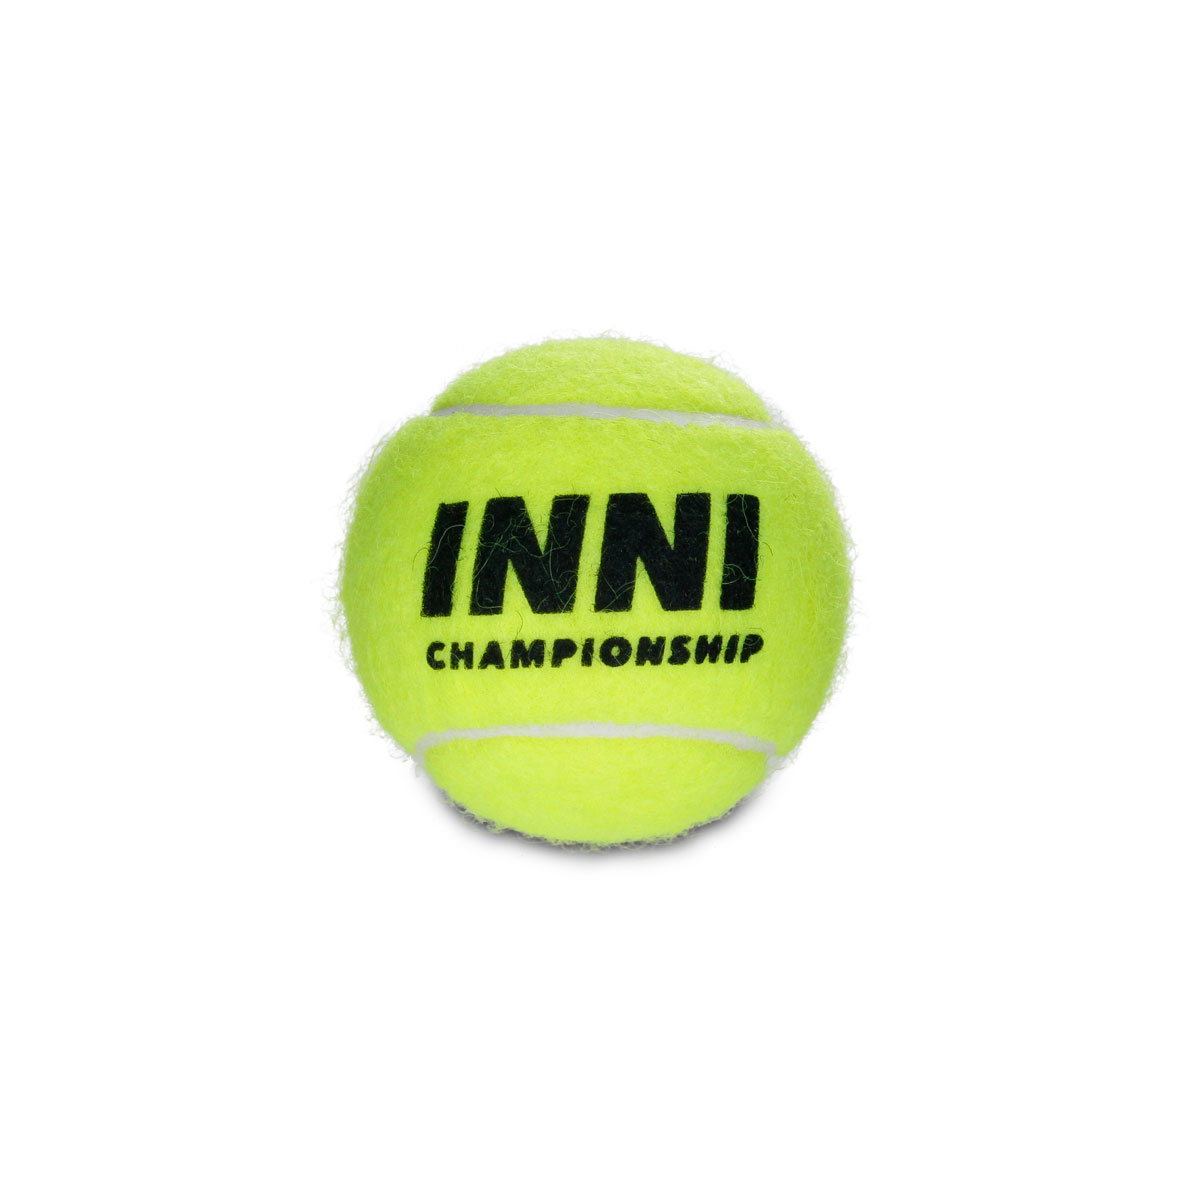 Bola De Tênis Inni Championship - 6 Tubos de 3 Bolas